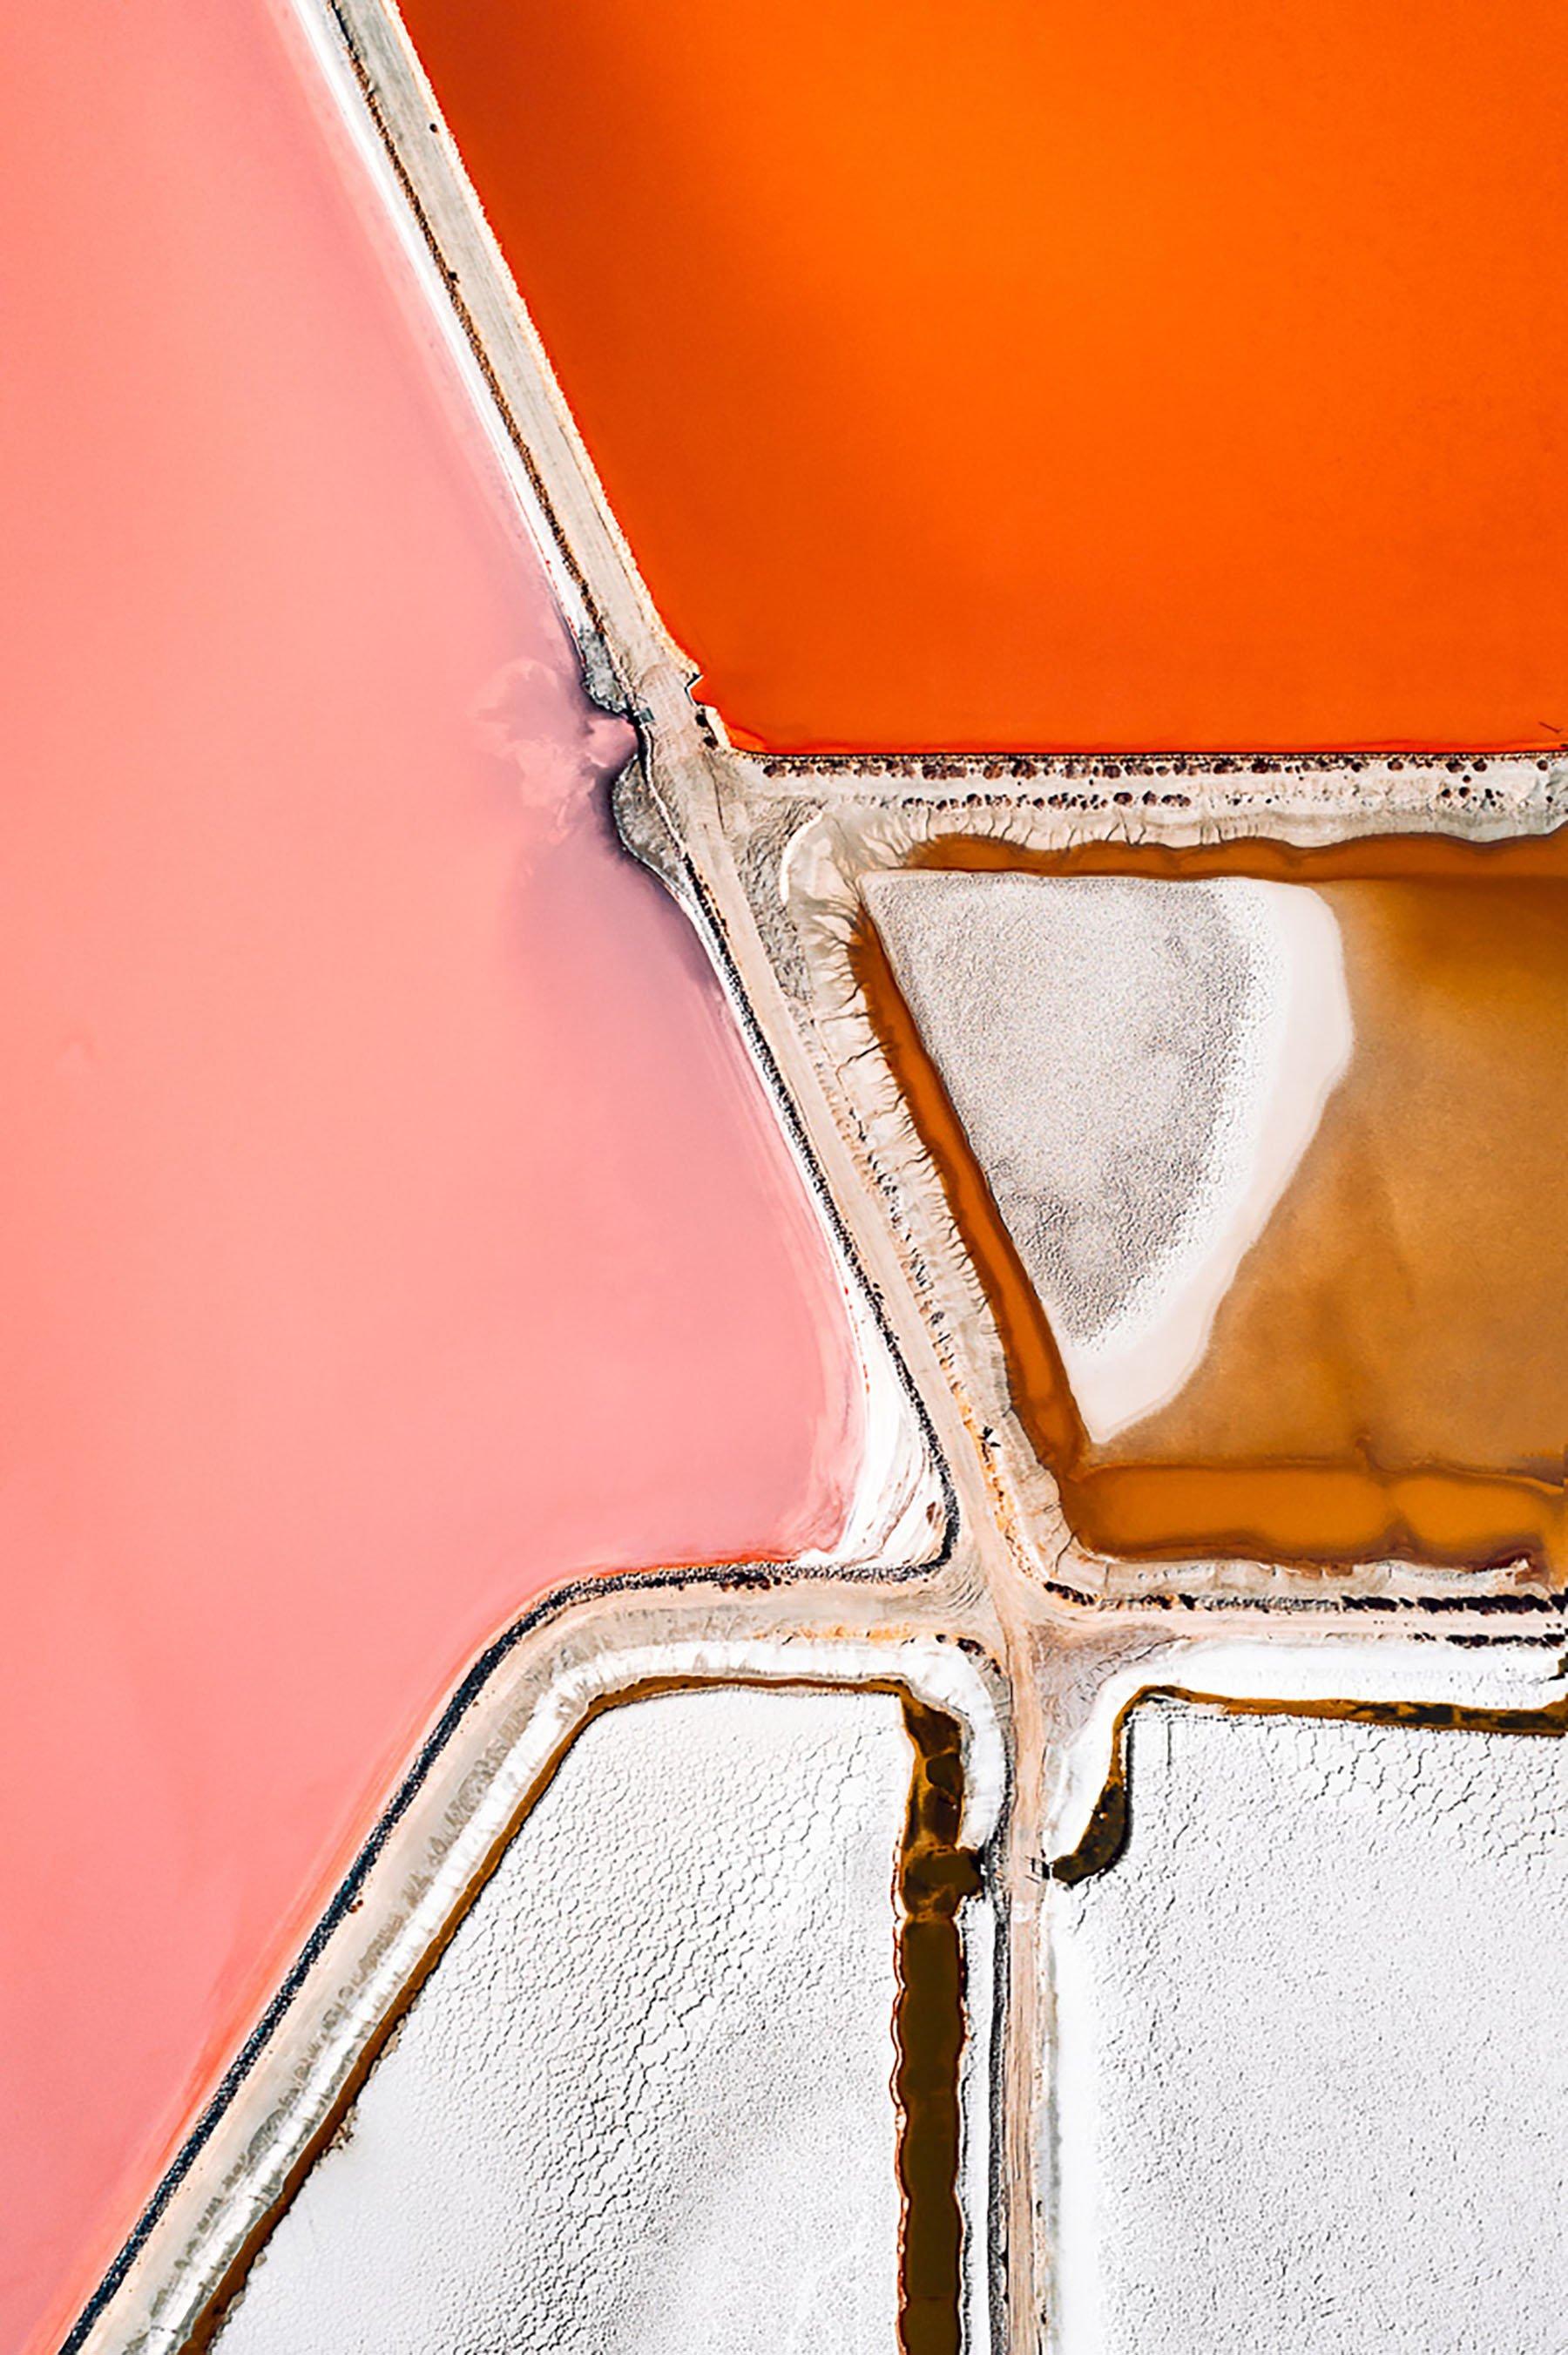 iGNANT-Photography-Tom-Hegen-The-Salt-Series-009